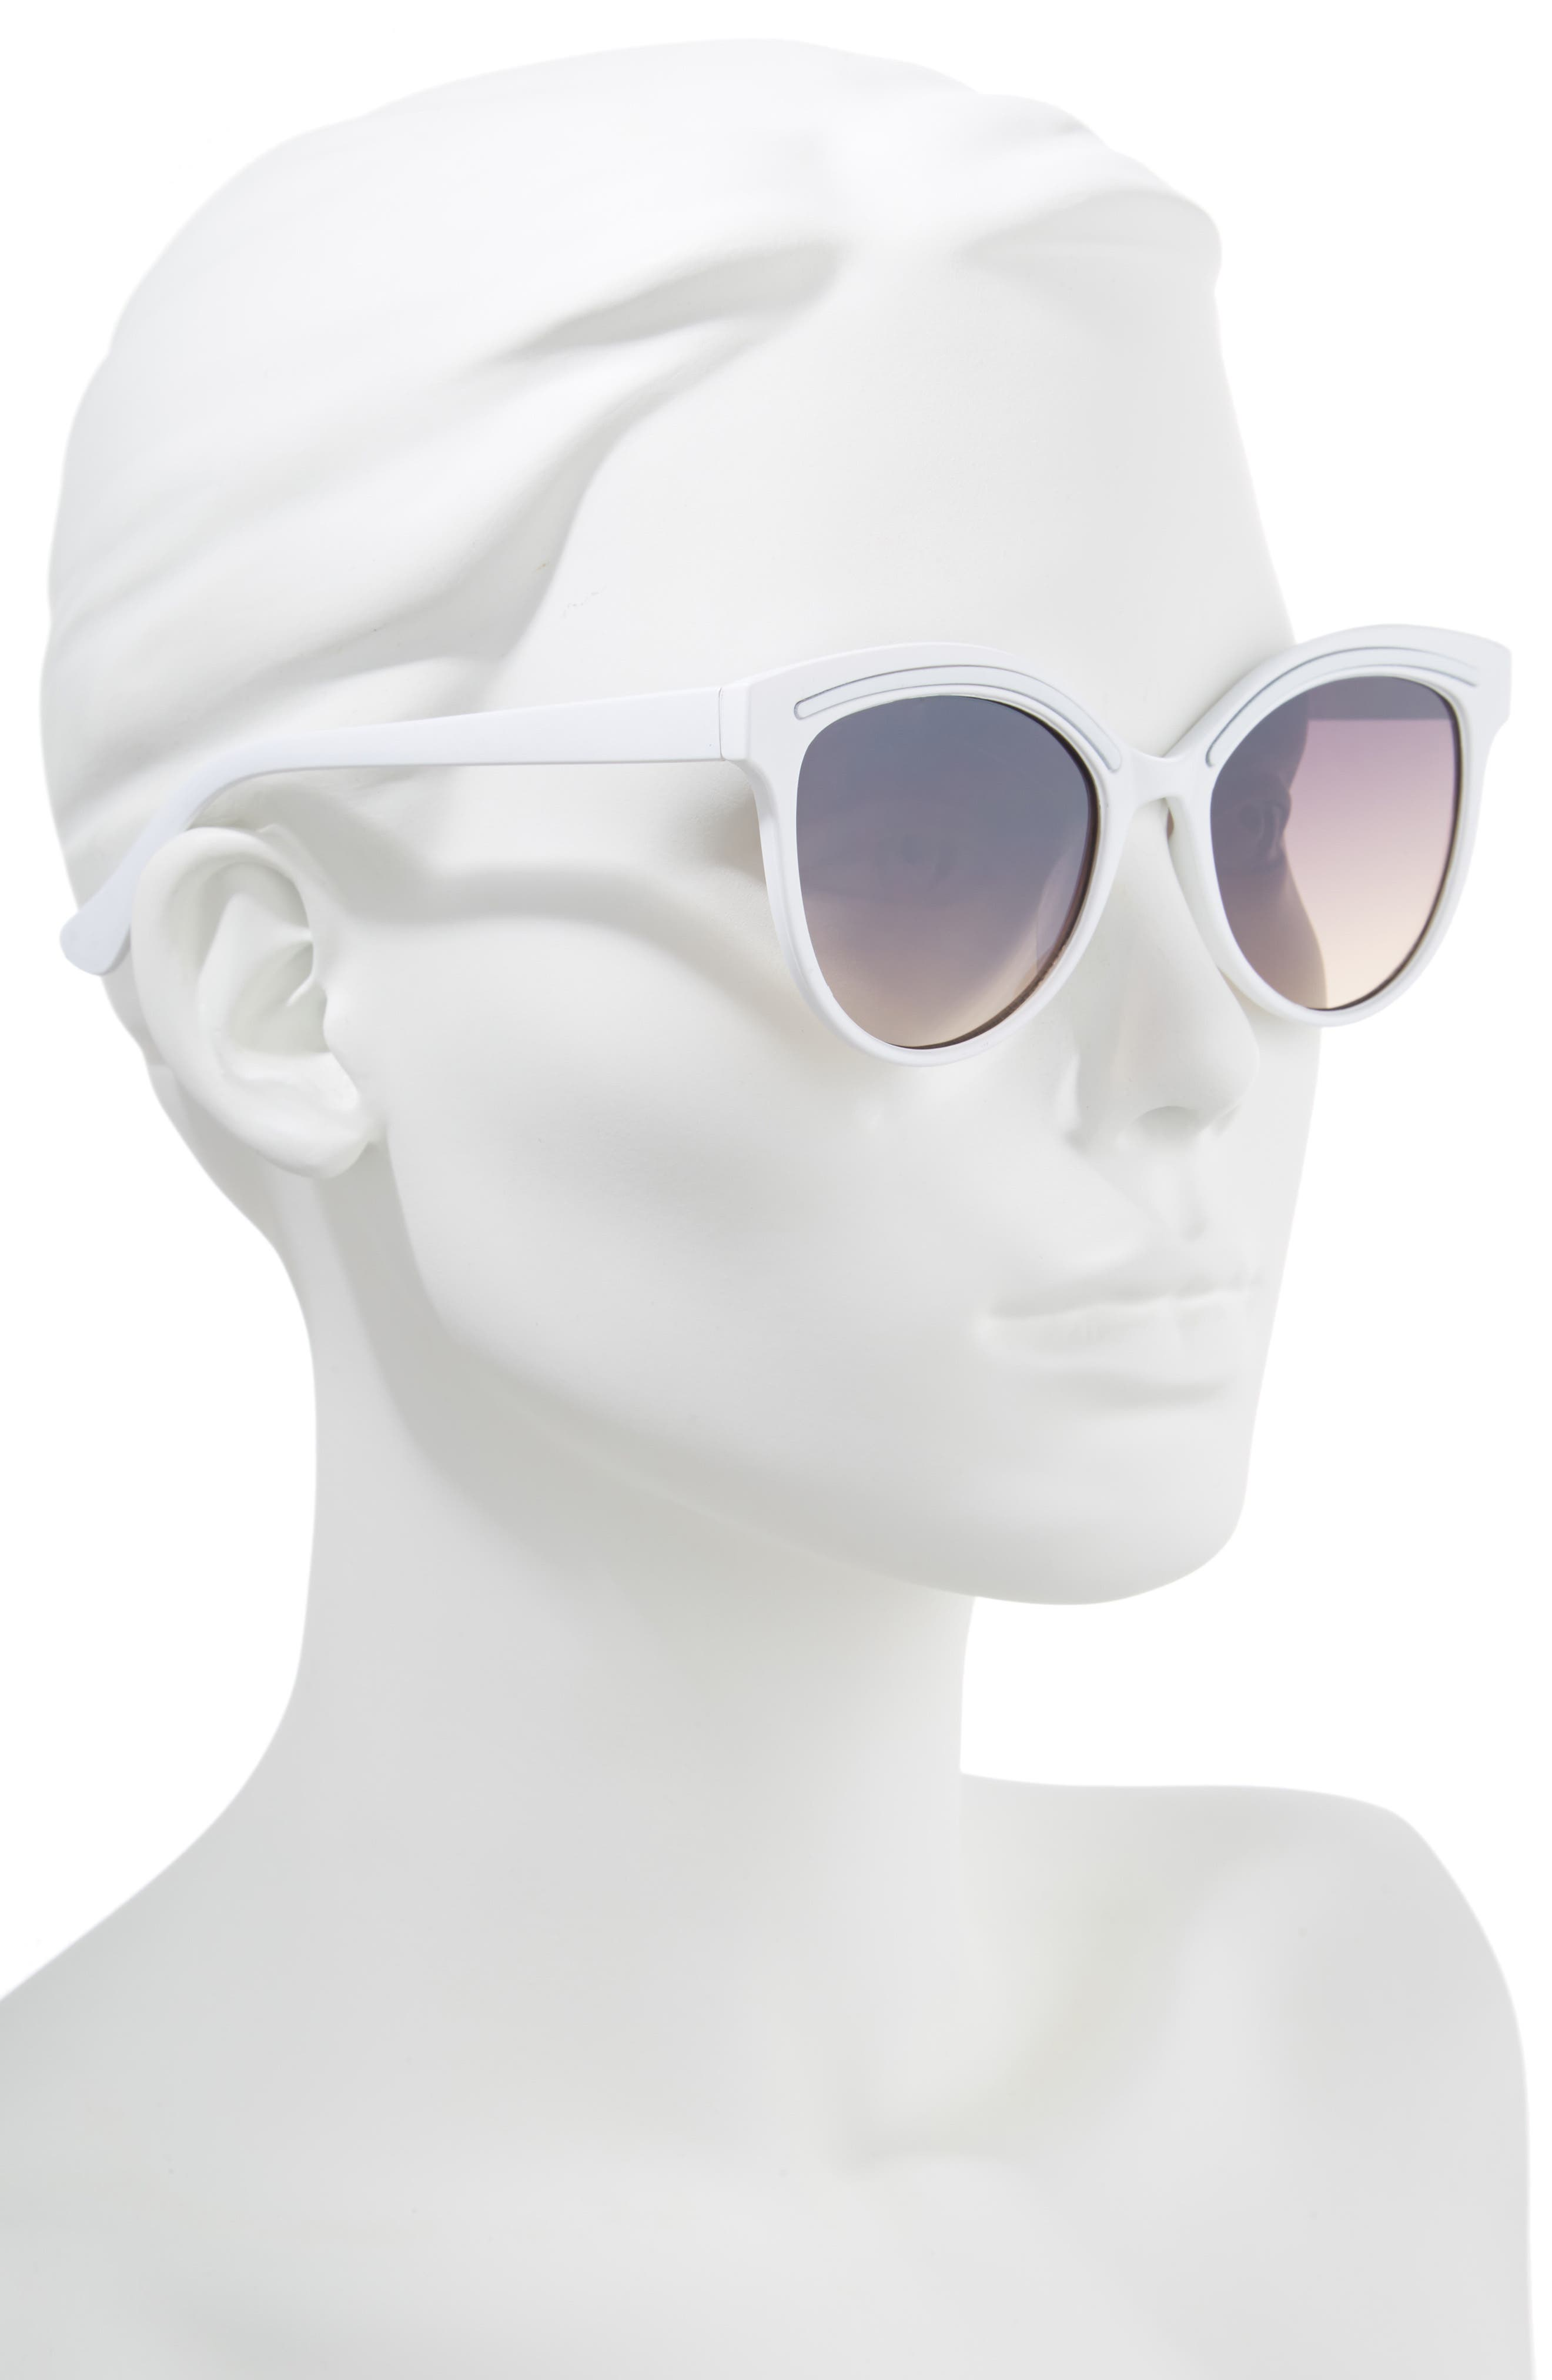 59mm Metallic Accent Cat Eye Sunglasses,                             Alternate thumbnail 2, color,                             White